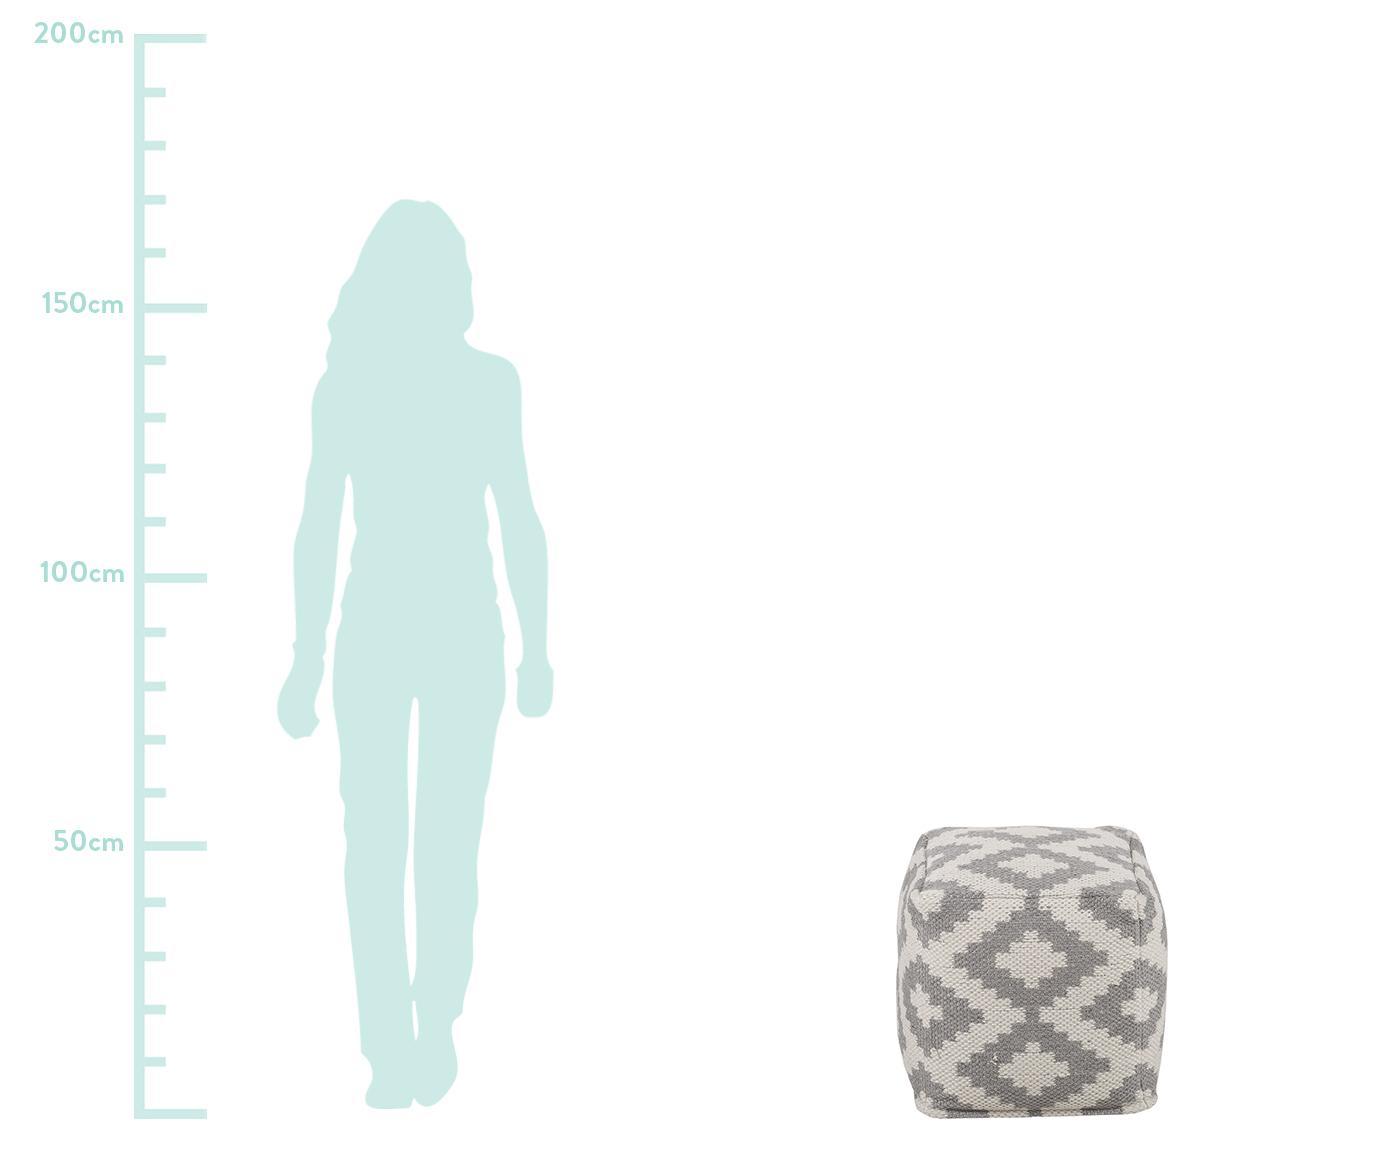 Pouf da interno-esterno Napua, Rivestimento: 100% poliestere riciclato, Grigio, Ecru, Larg. 40 x Alt. 40 cm